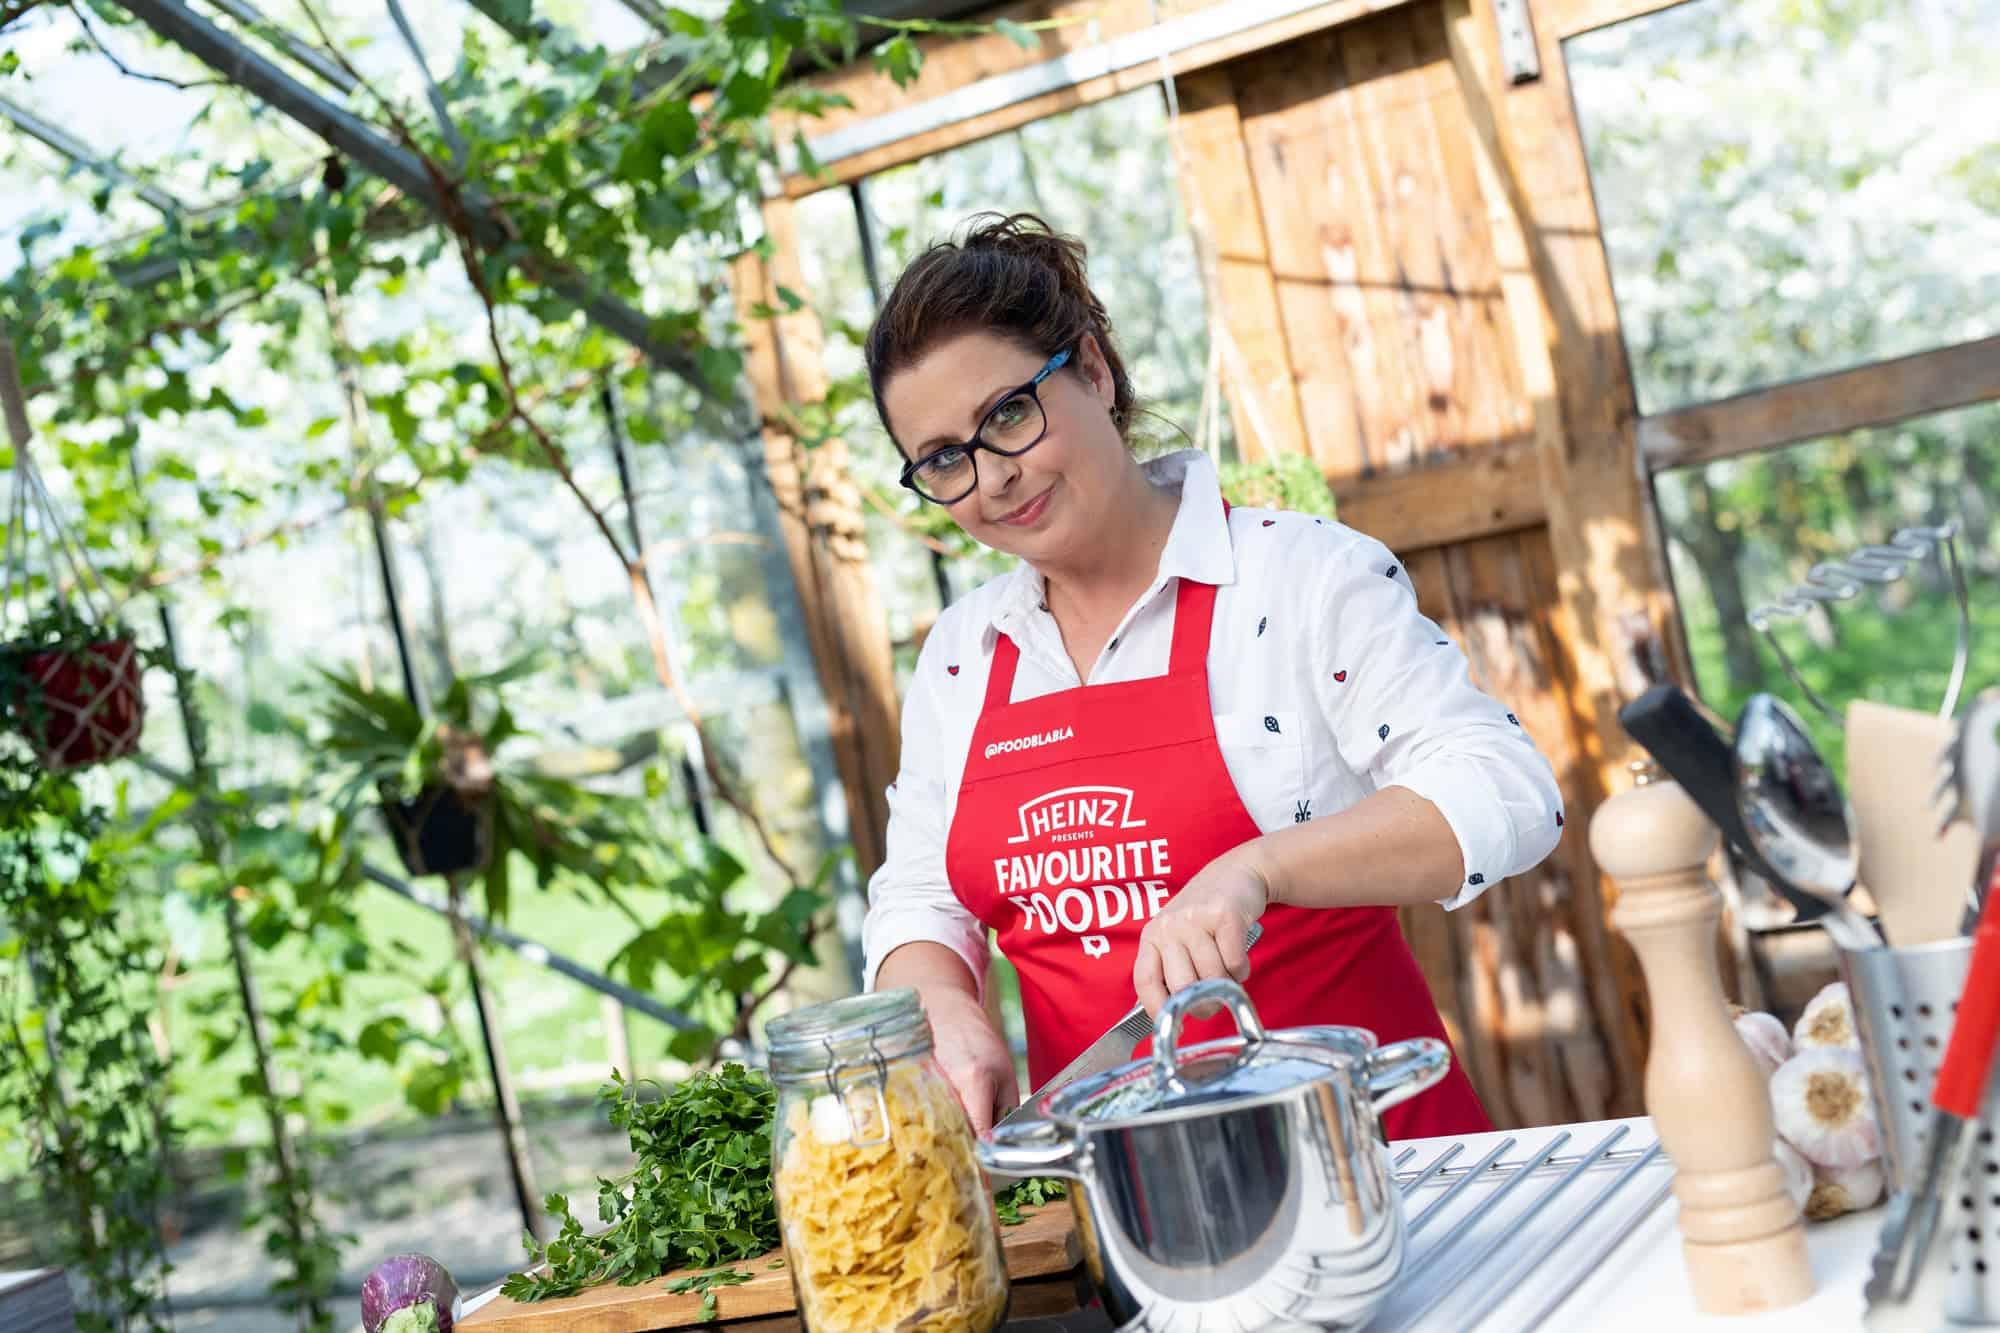 Heinz - Jacqueline - Foodblabla